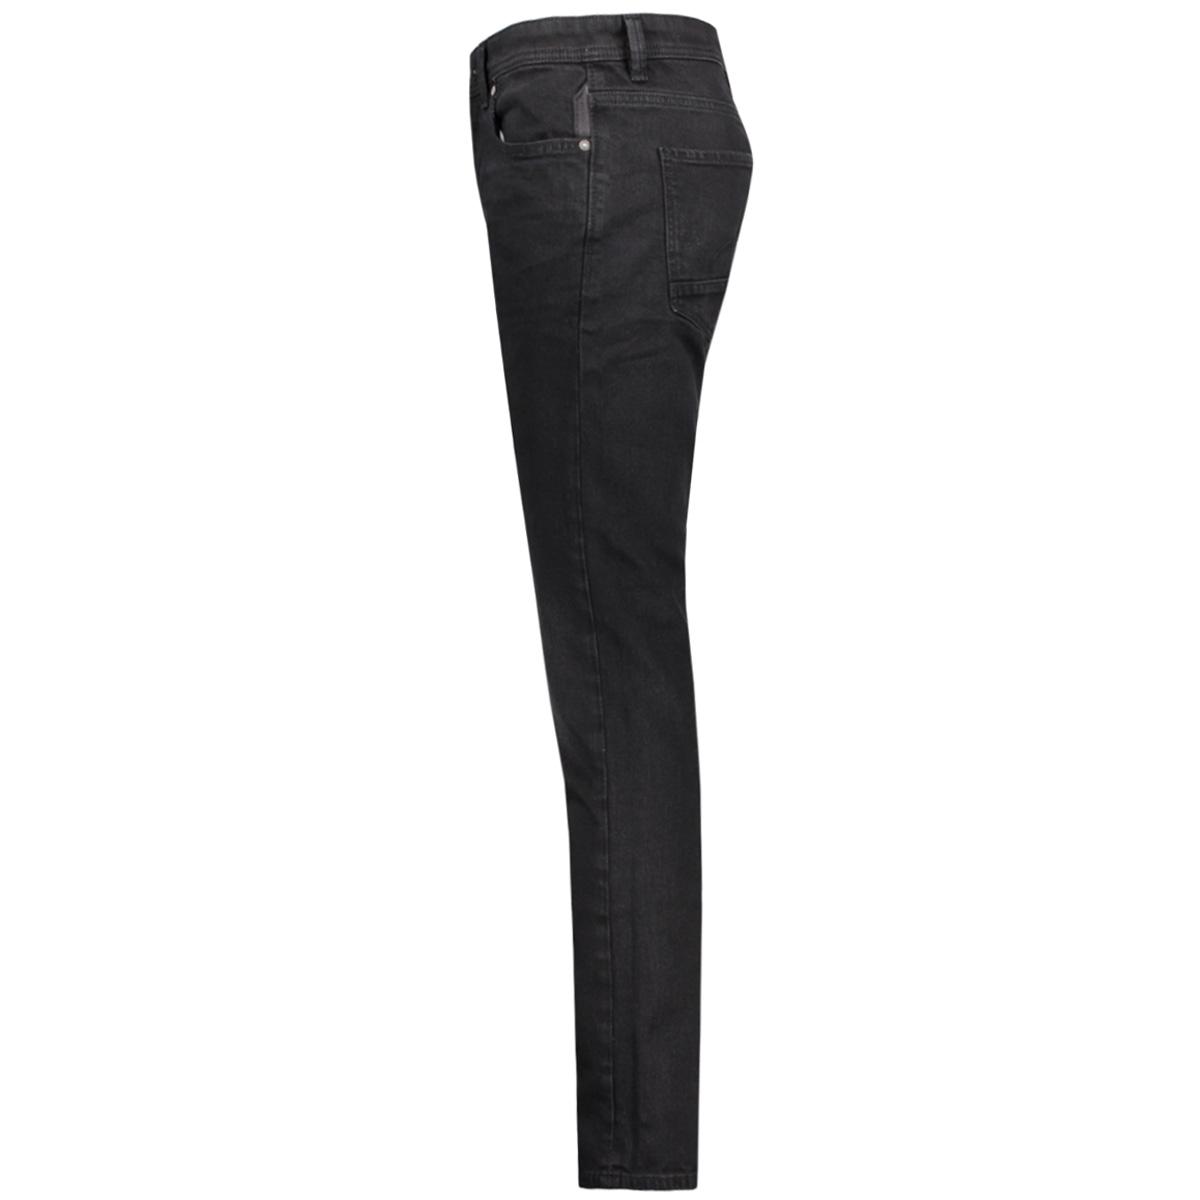 127cc2b008 edc jeans c911